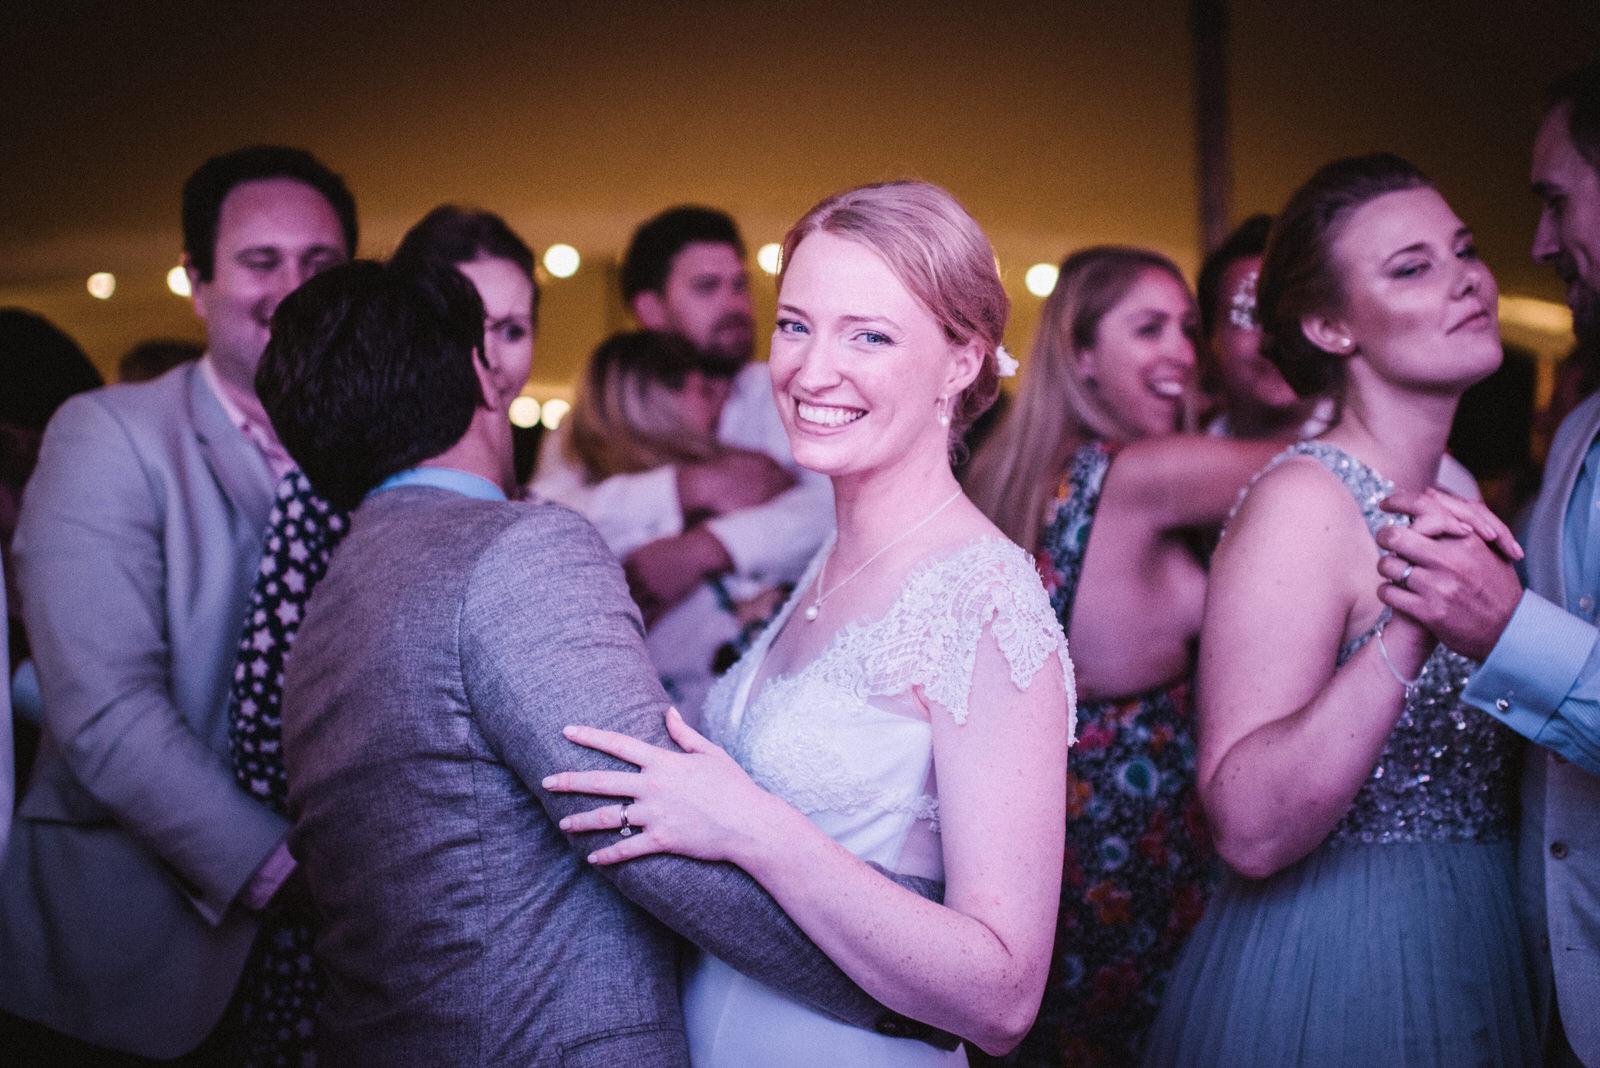 041-LOURMARIN-WEDDING-PHOTOGRAPHER-PROVENCE-WEDDING-ALTERNATIVE-WEDDING-PHOTOGRAPHY-FRANCE-PROVENCE-GARDEN-WEDDING.JPG